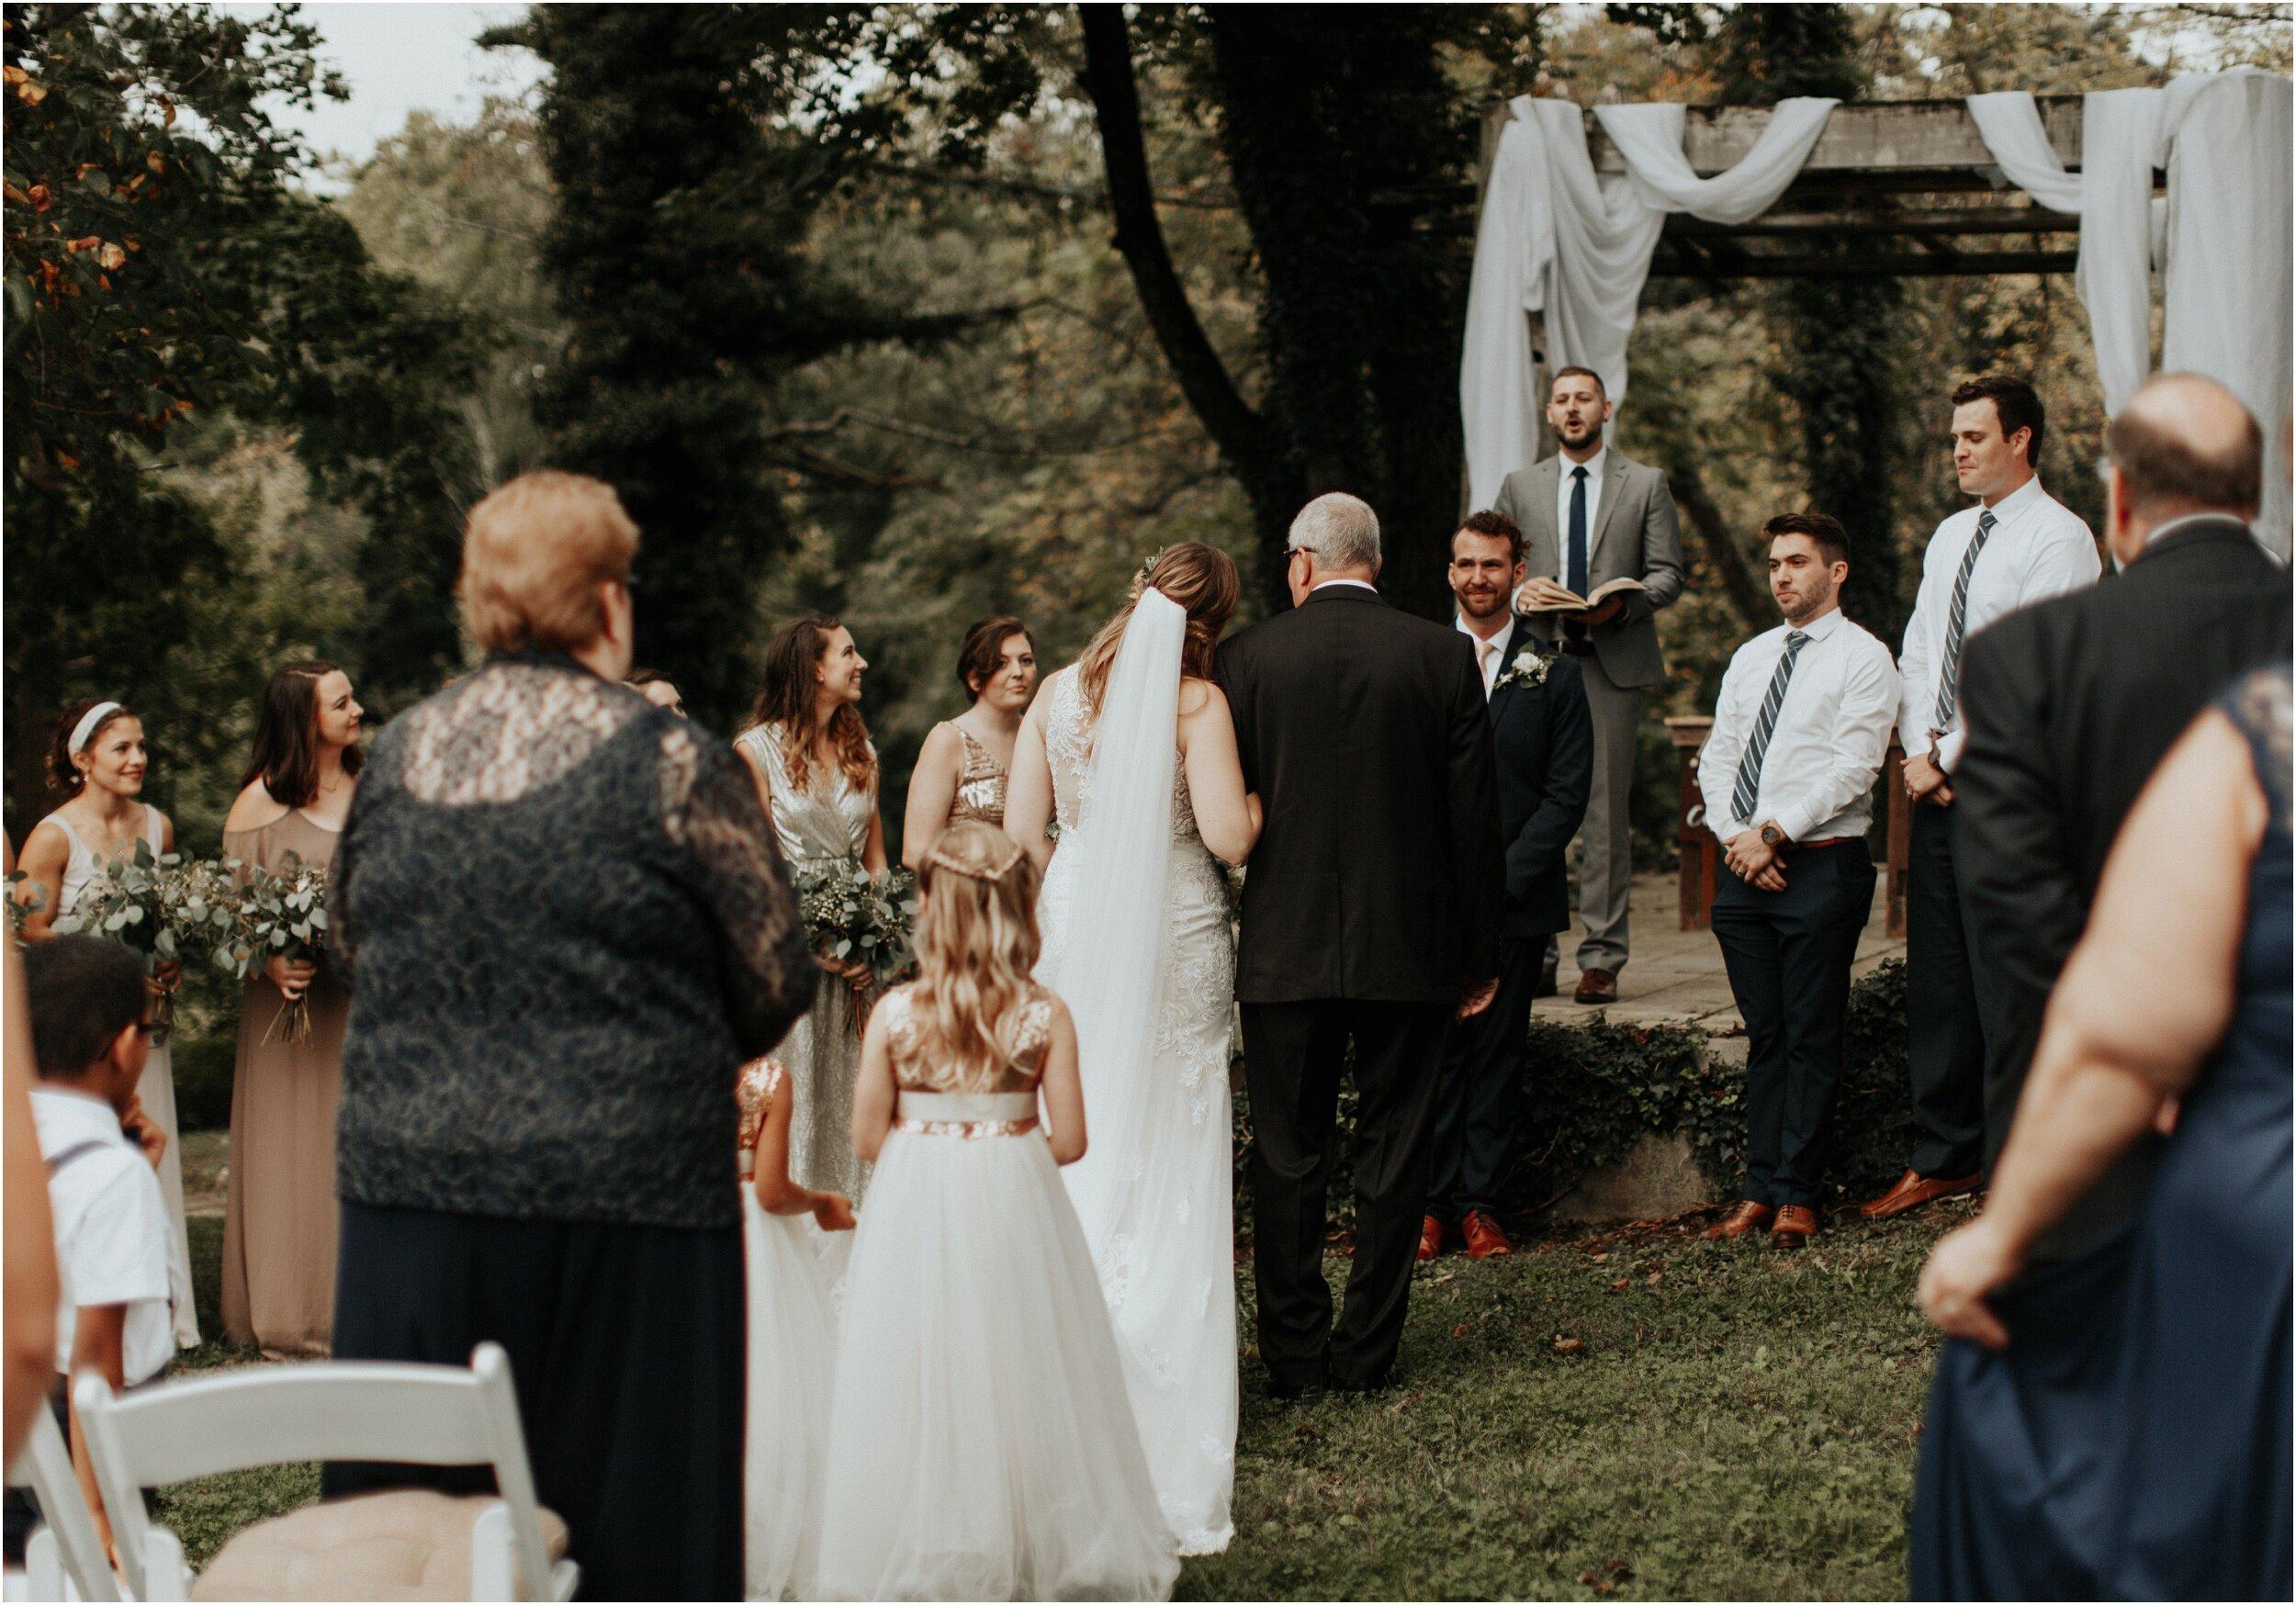 steph-and-jordan-cox-our-wedding-historic-shady-lane-compass-wedding-collective-hazel-lining-photography-destination-elopement-wedding-engagement-photography_0058.jpg